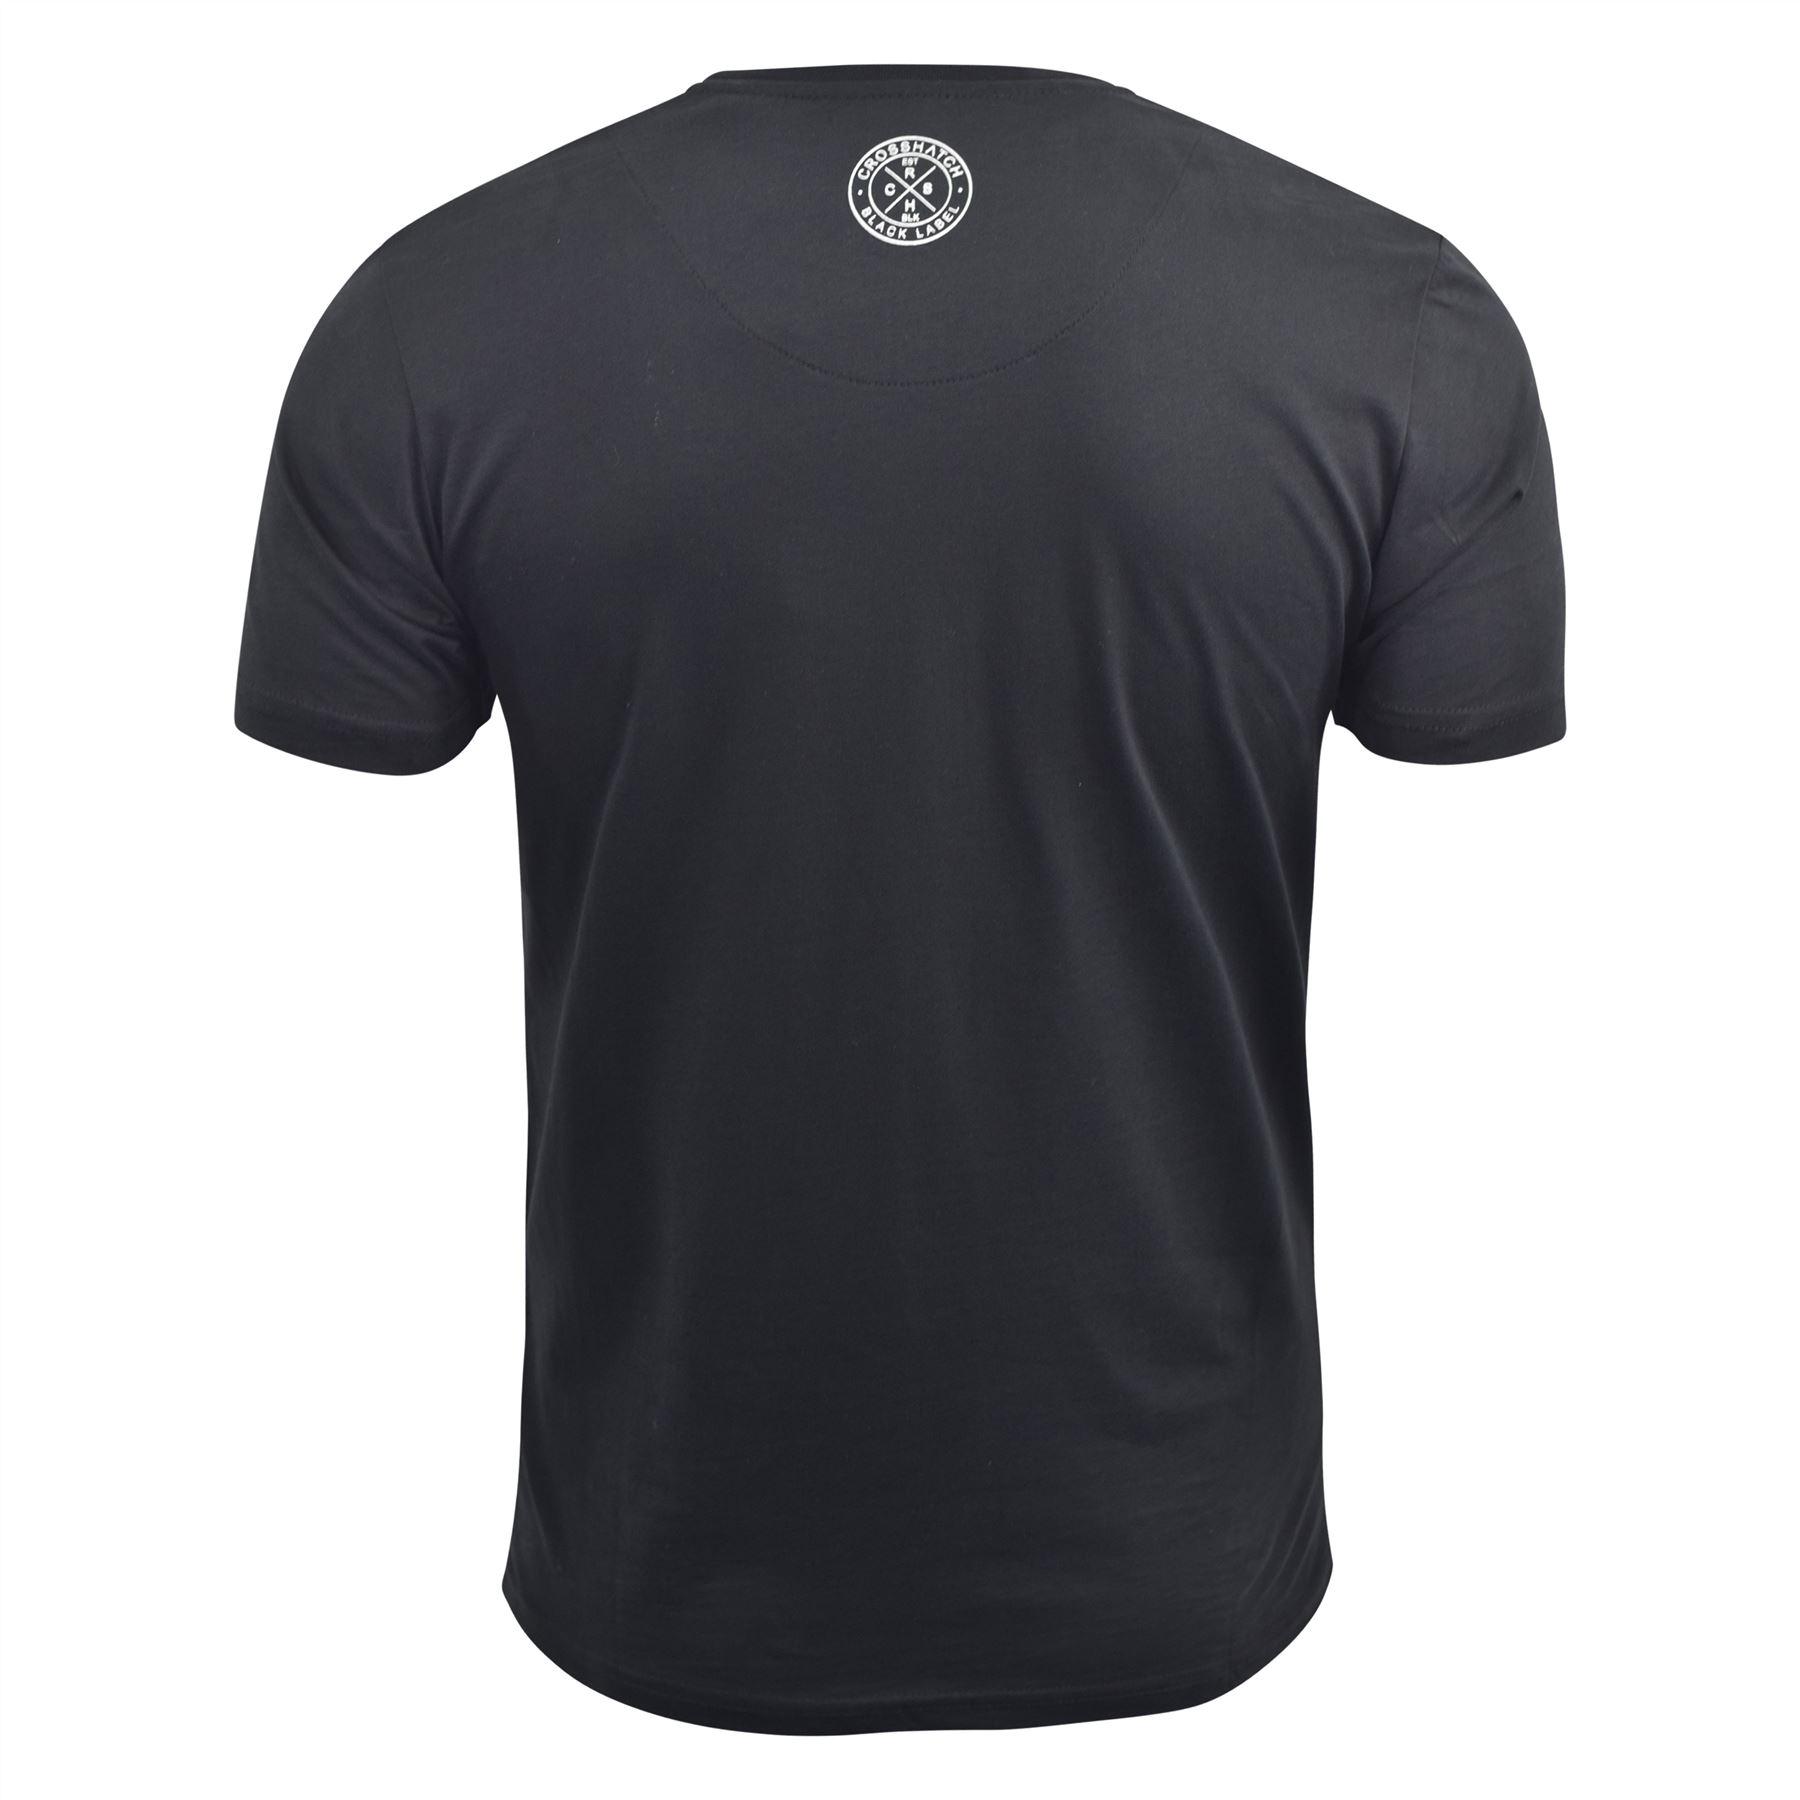 Para-Hombre-Crosshatch-Camiseta-Grafico-Cuello-Redondo-Manga-Corta-Camiseta-Top-wolvey miniatura 3